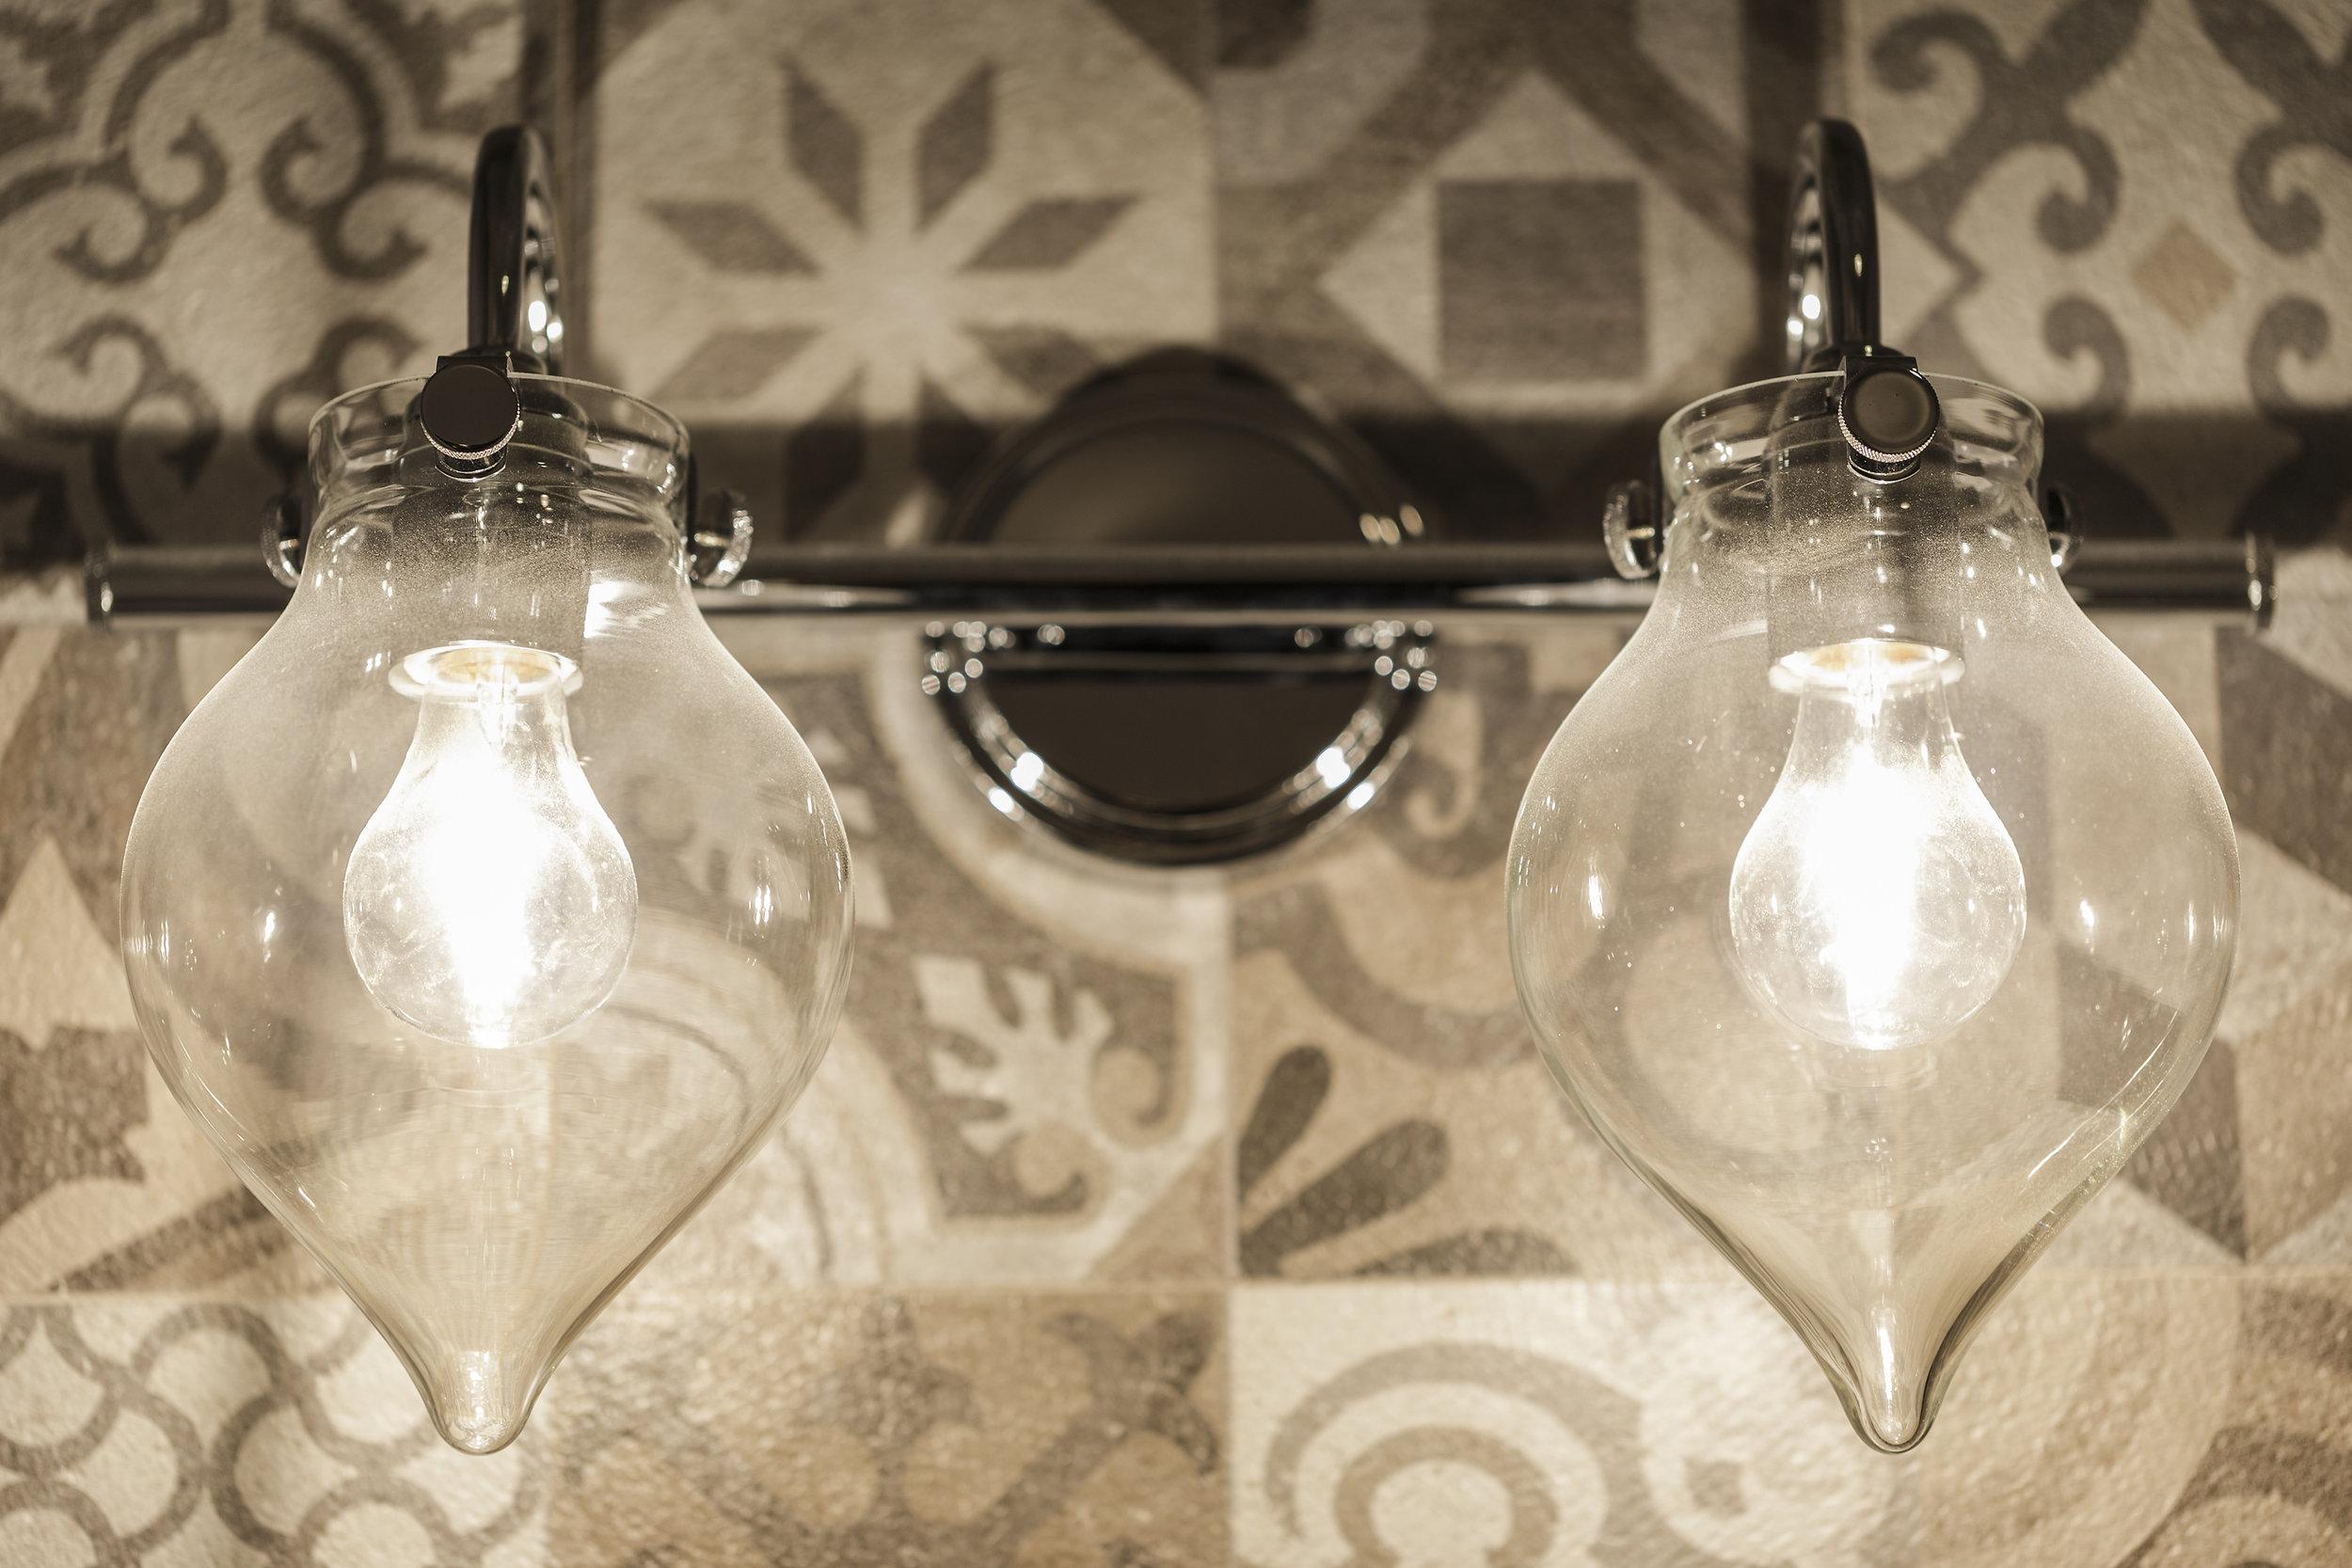 030-21825-Lomita-bath-light-high-res.jpg